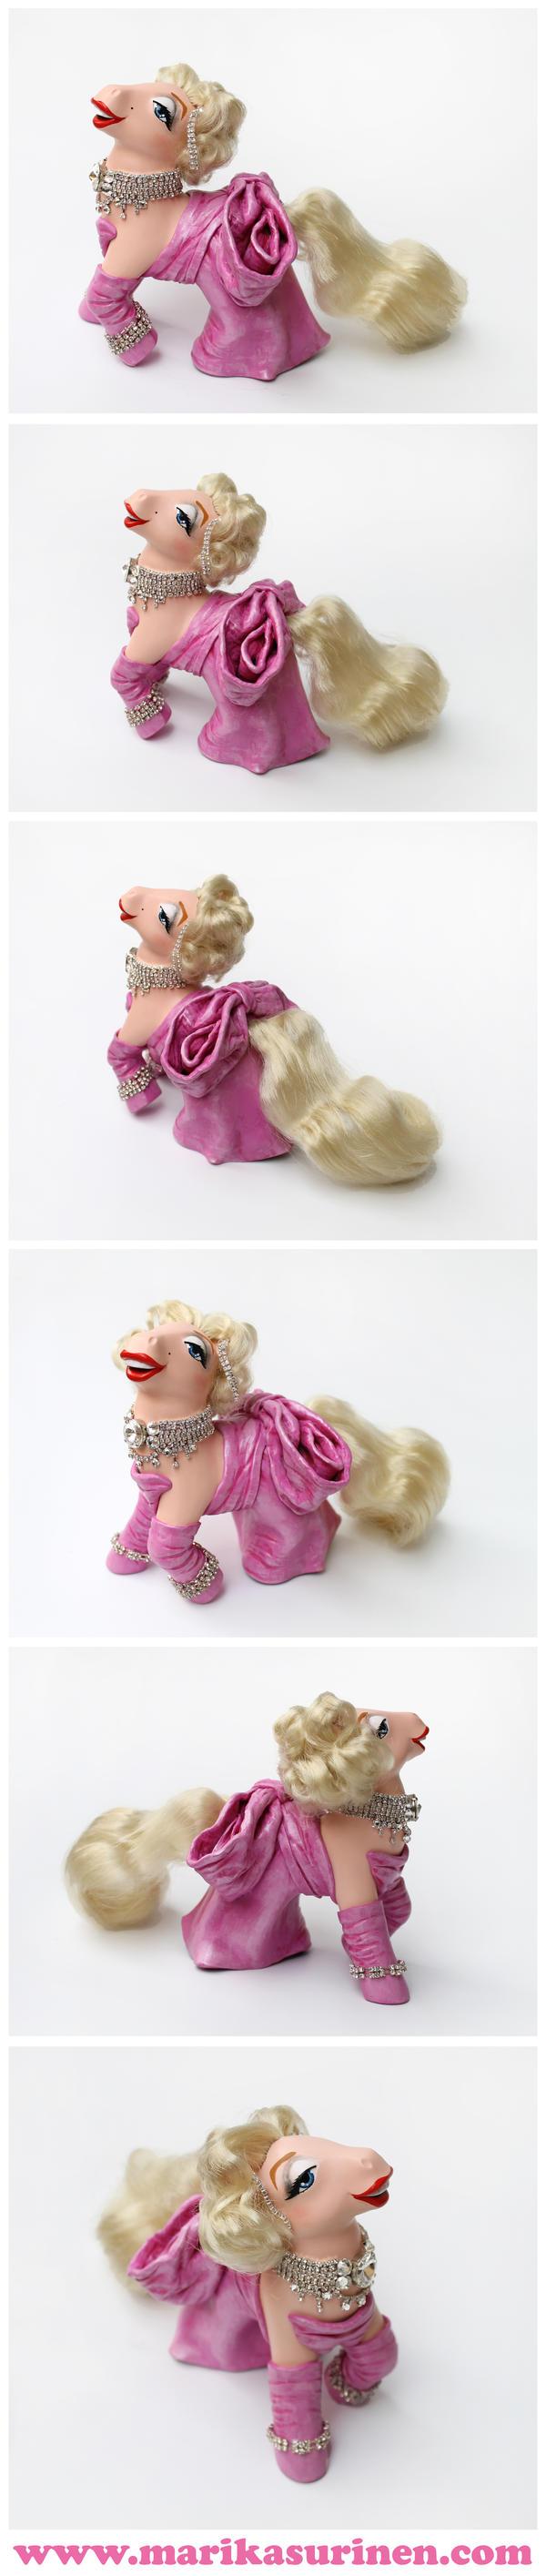 My Little Marilyn Monroe (2nd) by Spippo